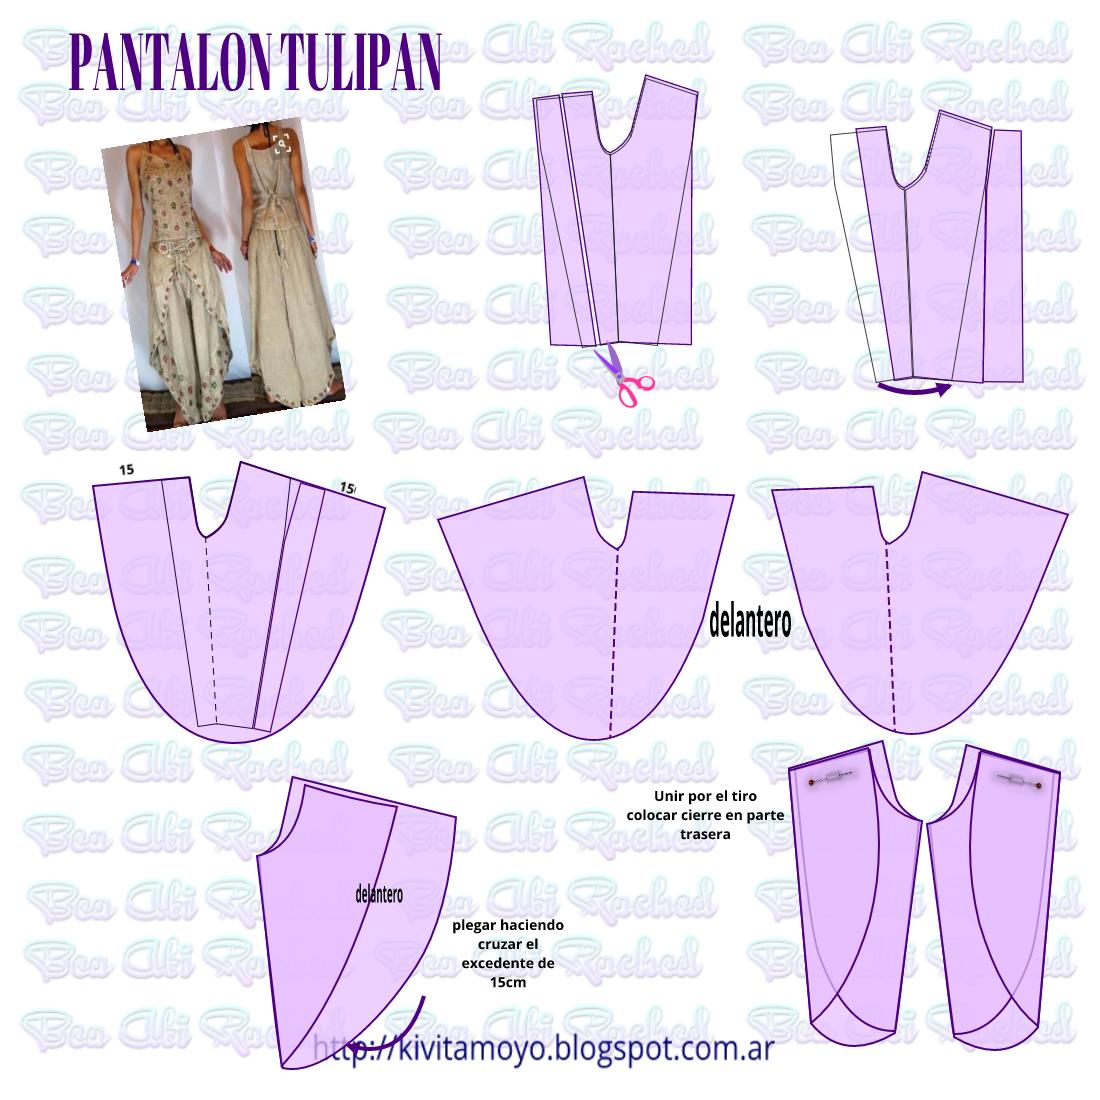 KiVita MoYo: Pantalon Tulipan | Condismod Patrones | Pinterest ...